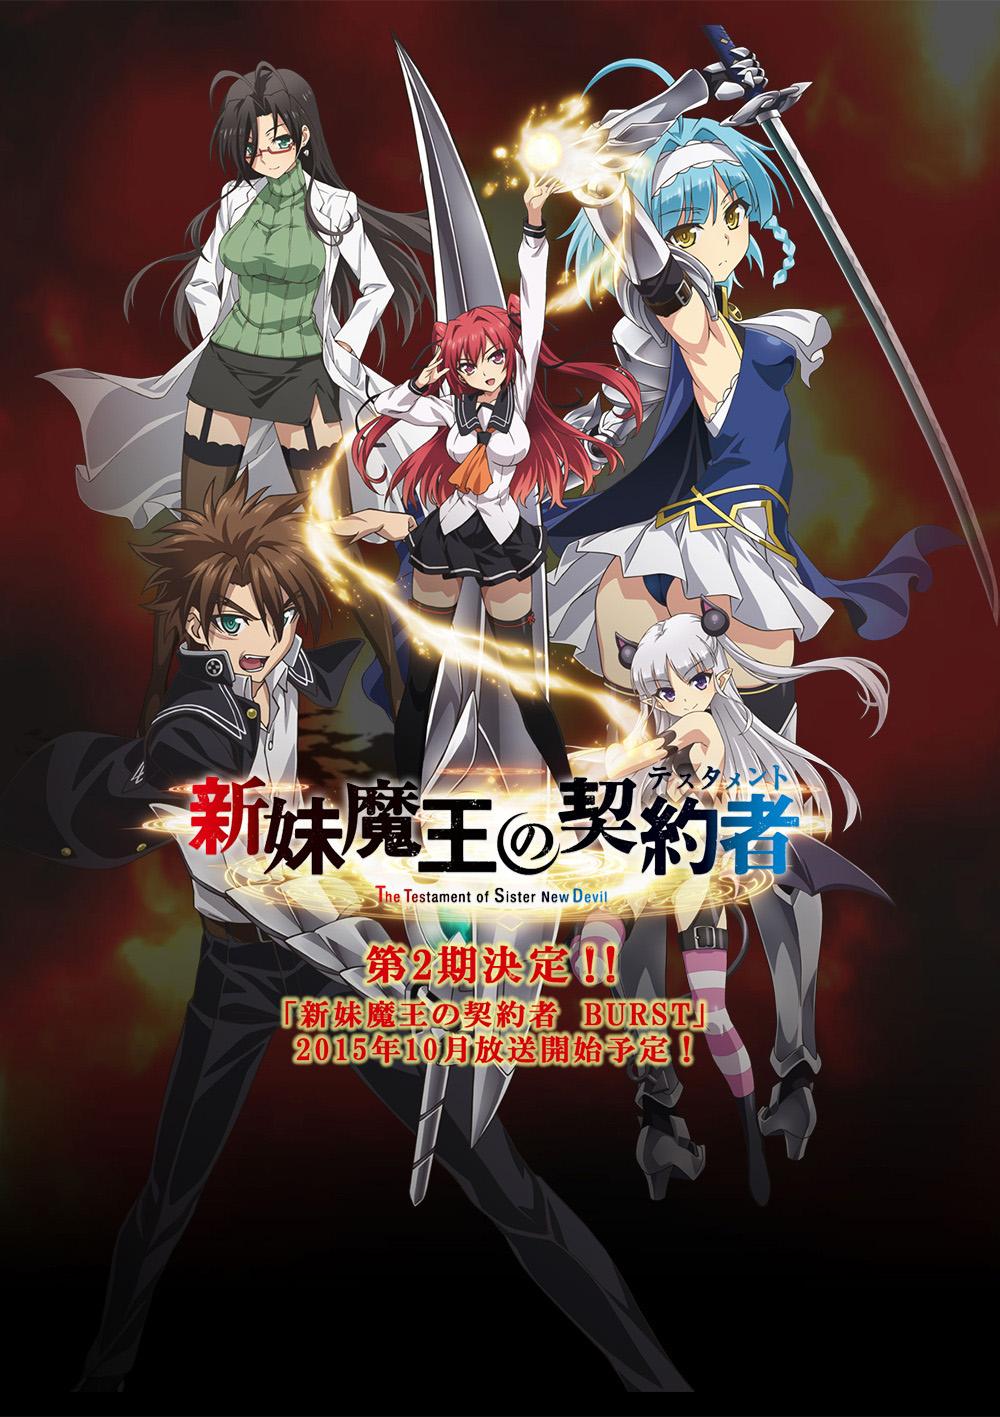 Shinmai Maou no Testament second season visual Shinmai Maou no Testament Burst